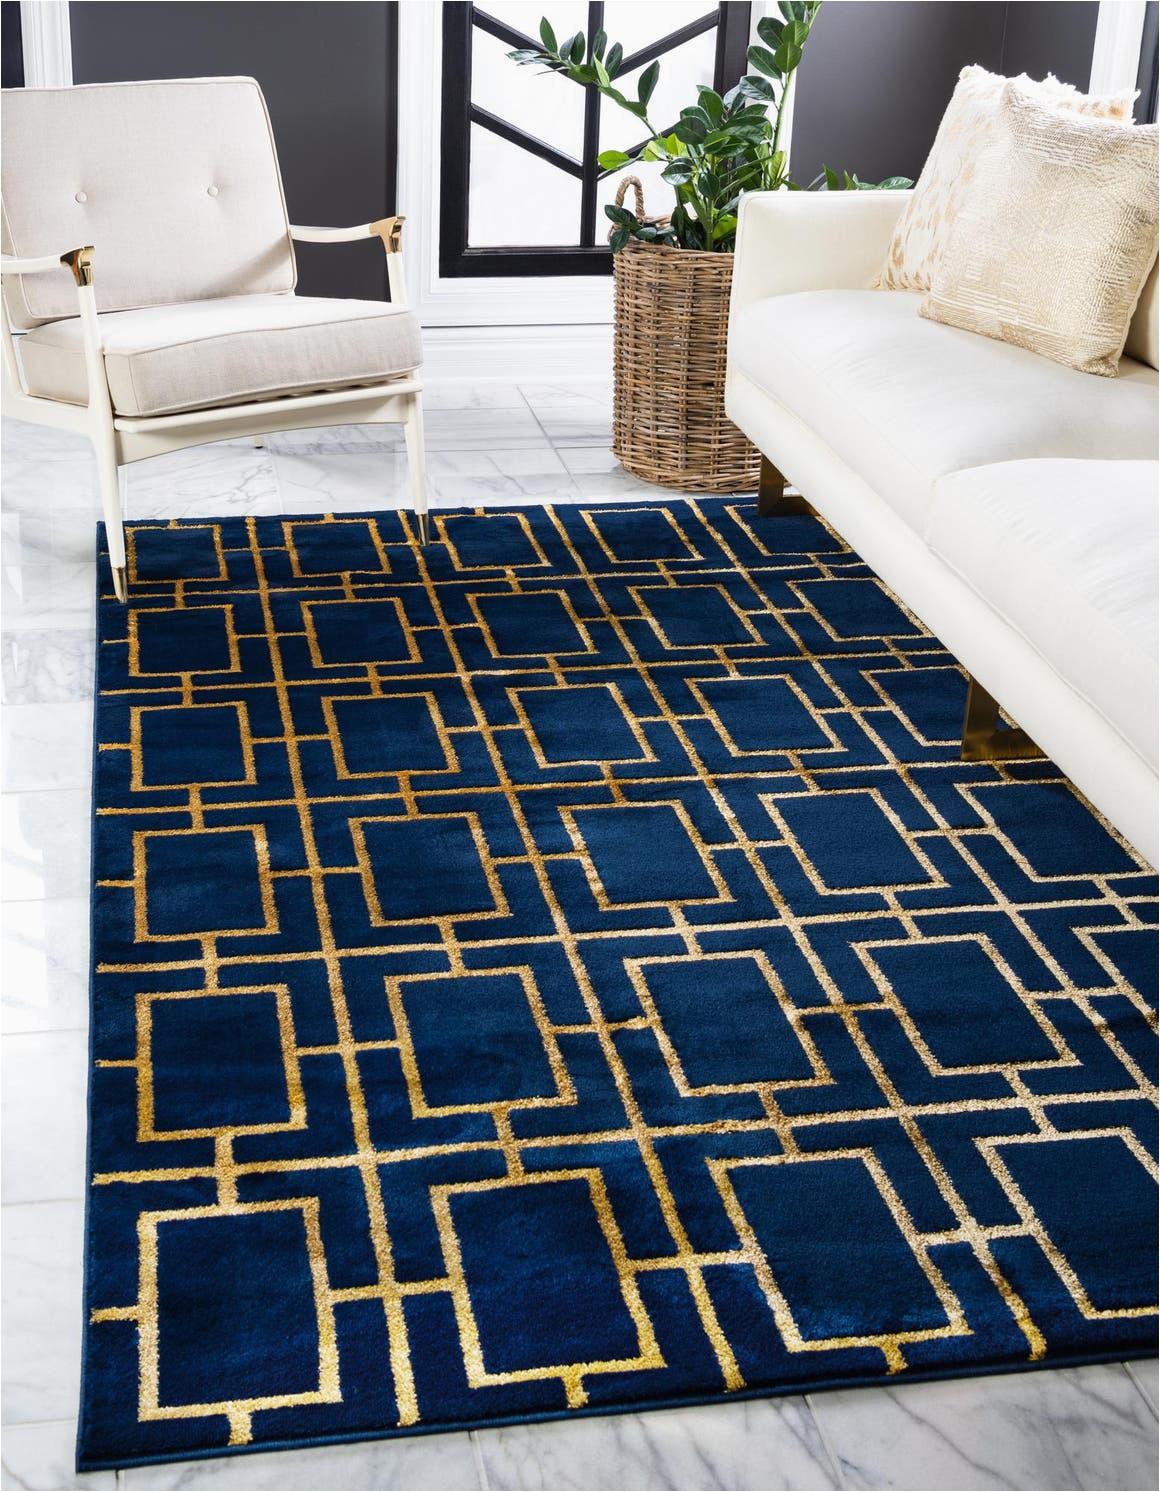 navy blue gold 5x8 marilyn monroe area rug